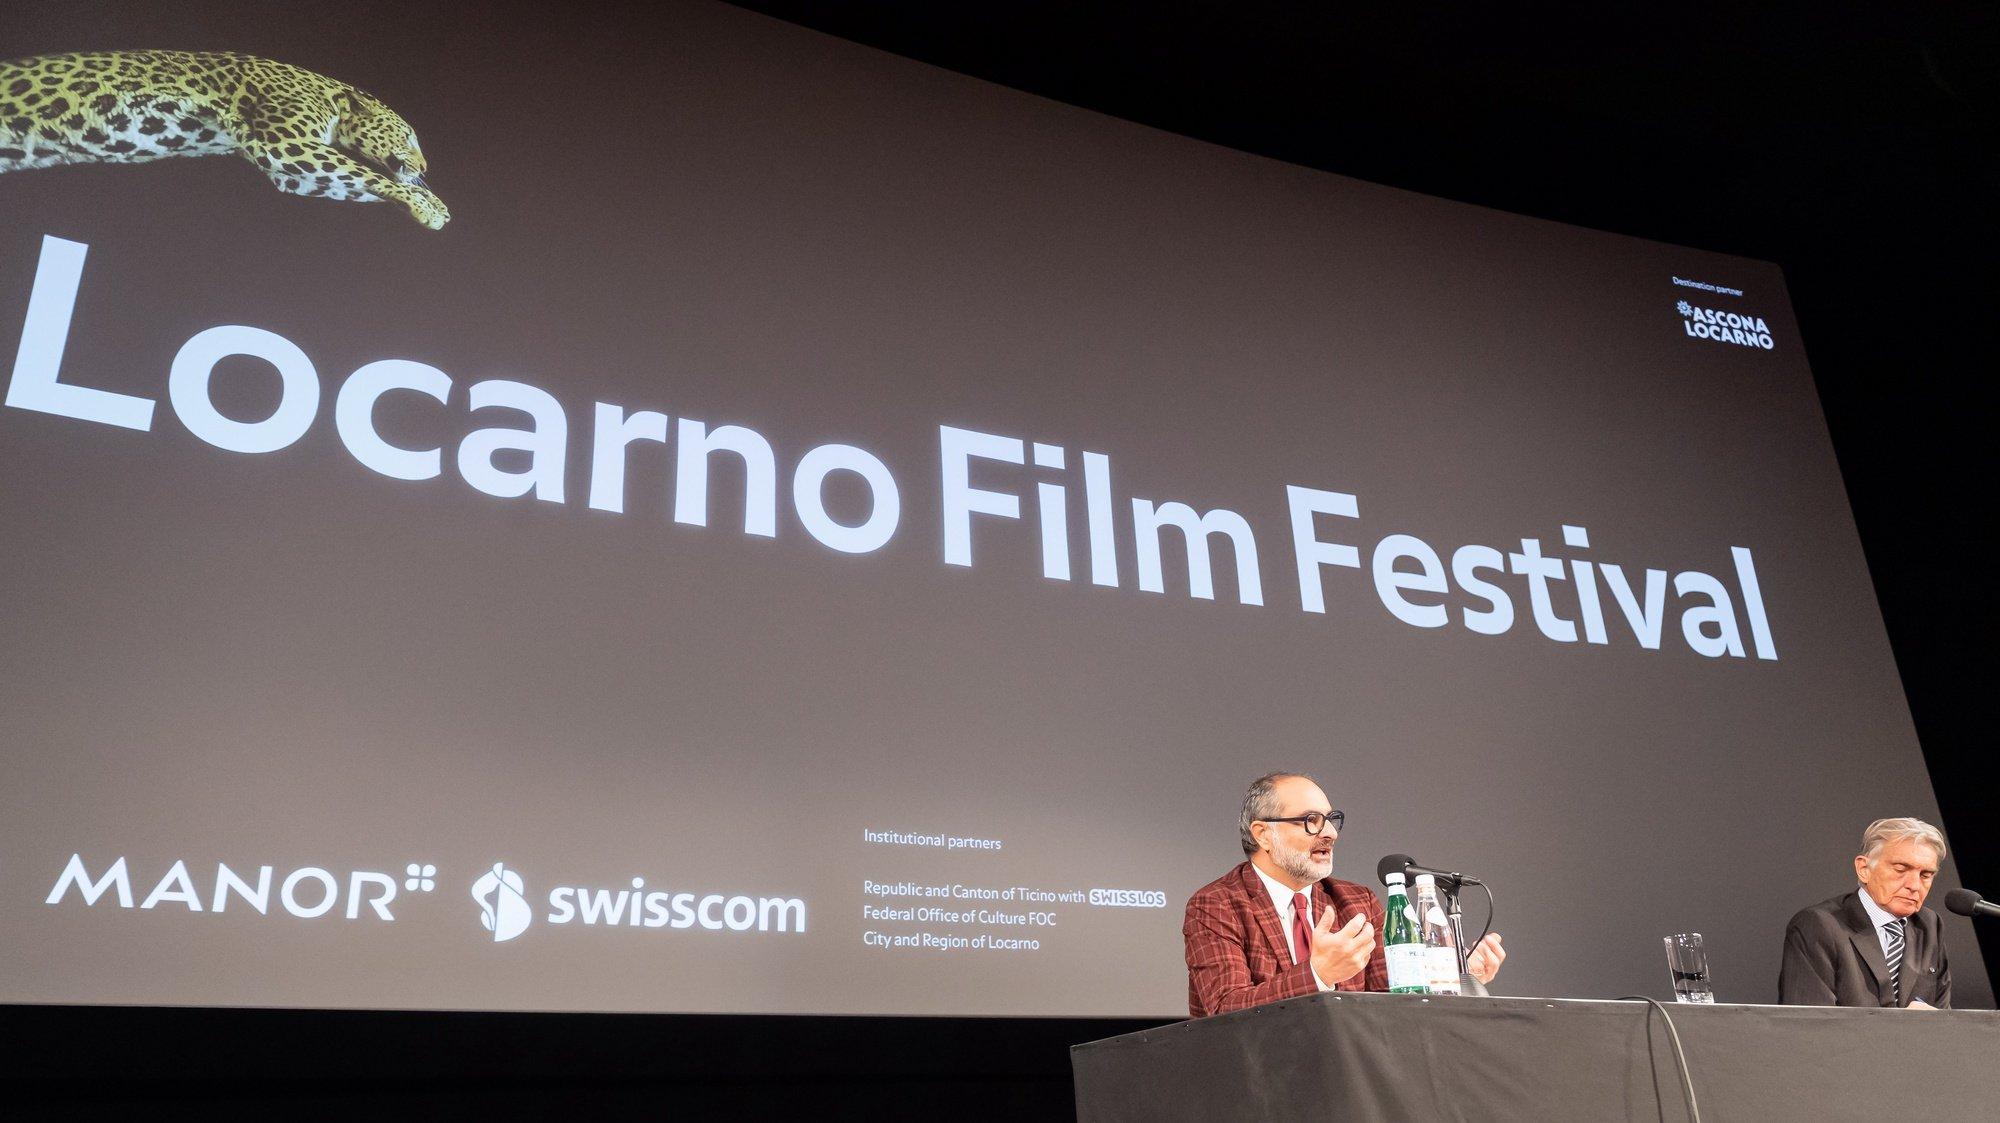 epa08799888 Giona A. Nazzaro (L) speaks during his presentation as new director of the Locarno Film Festival at a press conference in Locarno, Switzerland, 05 November 2020.  EPA/DAVIDE AGOSTA